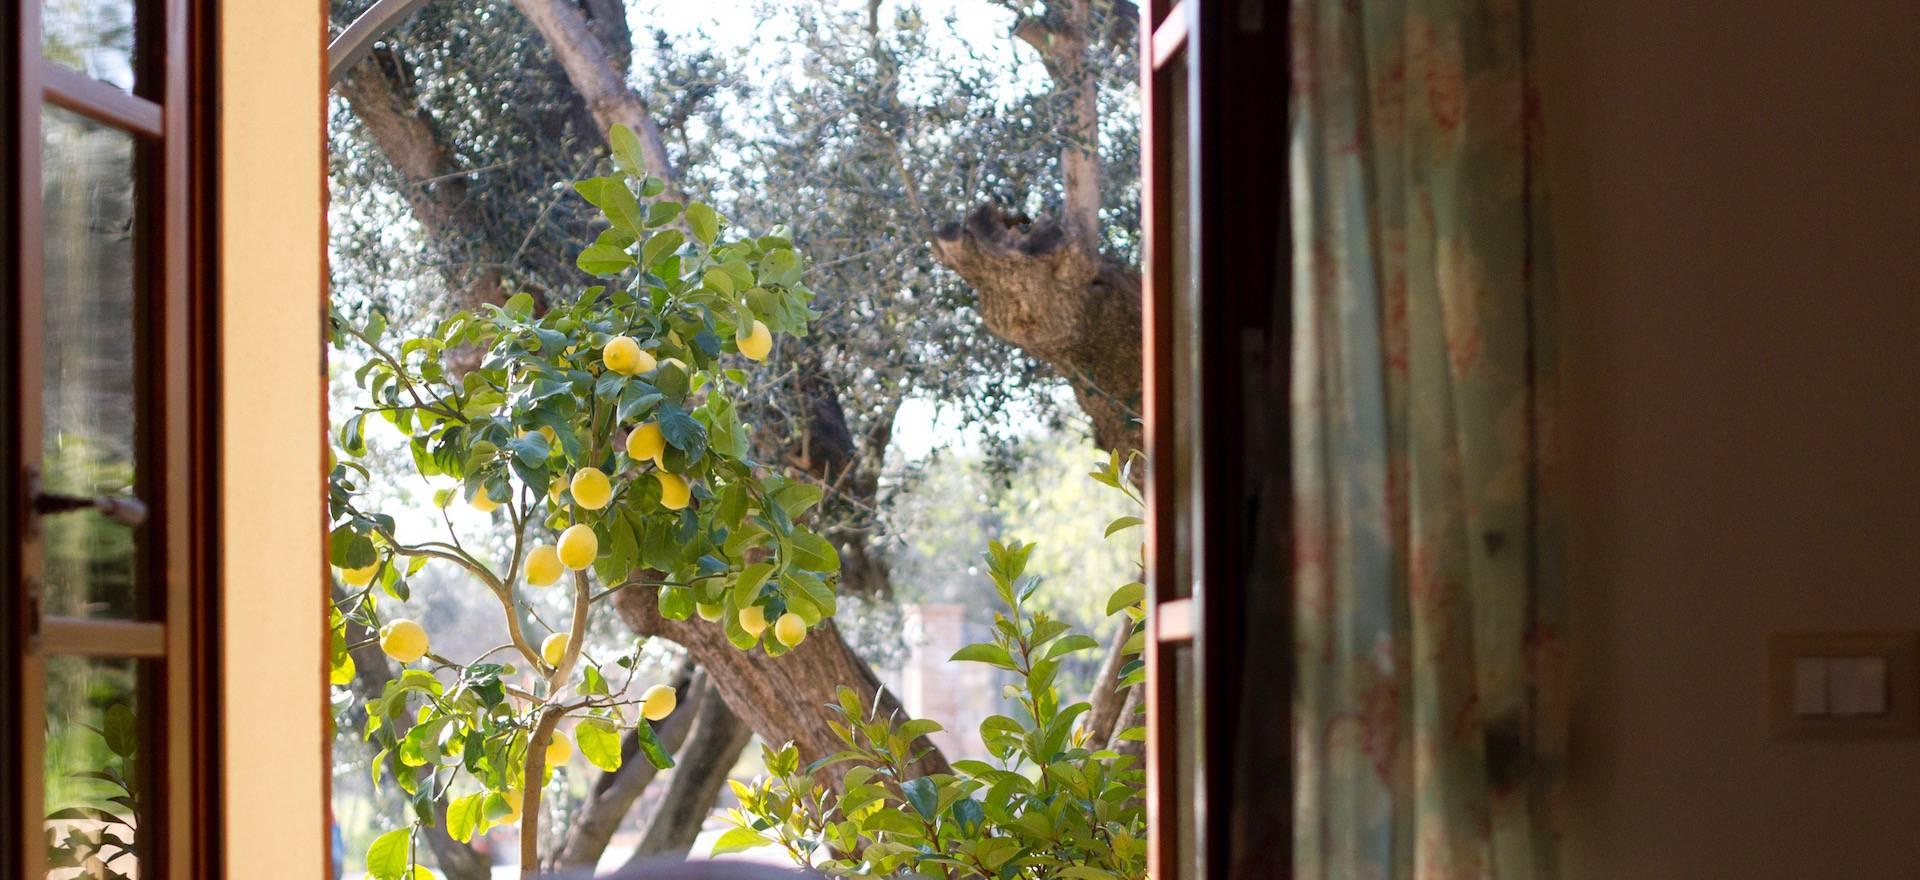 Agriturismo Toskana Agriturismo Toskana, zwischen Olivenbäumen, strandnah